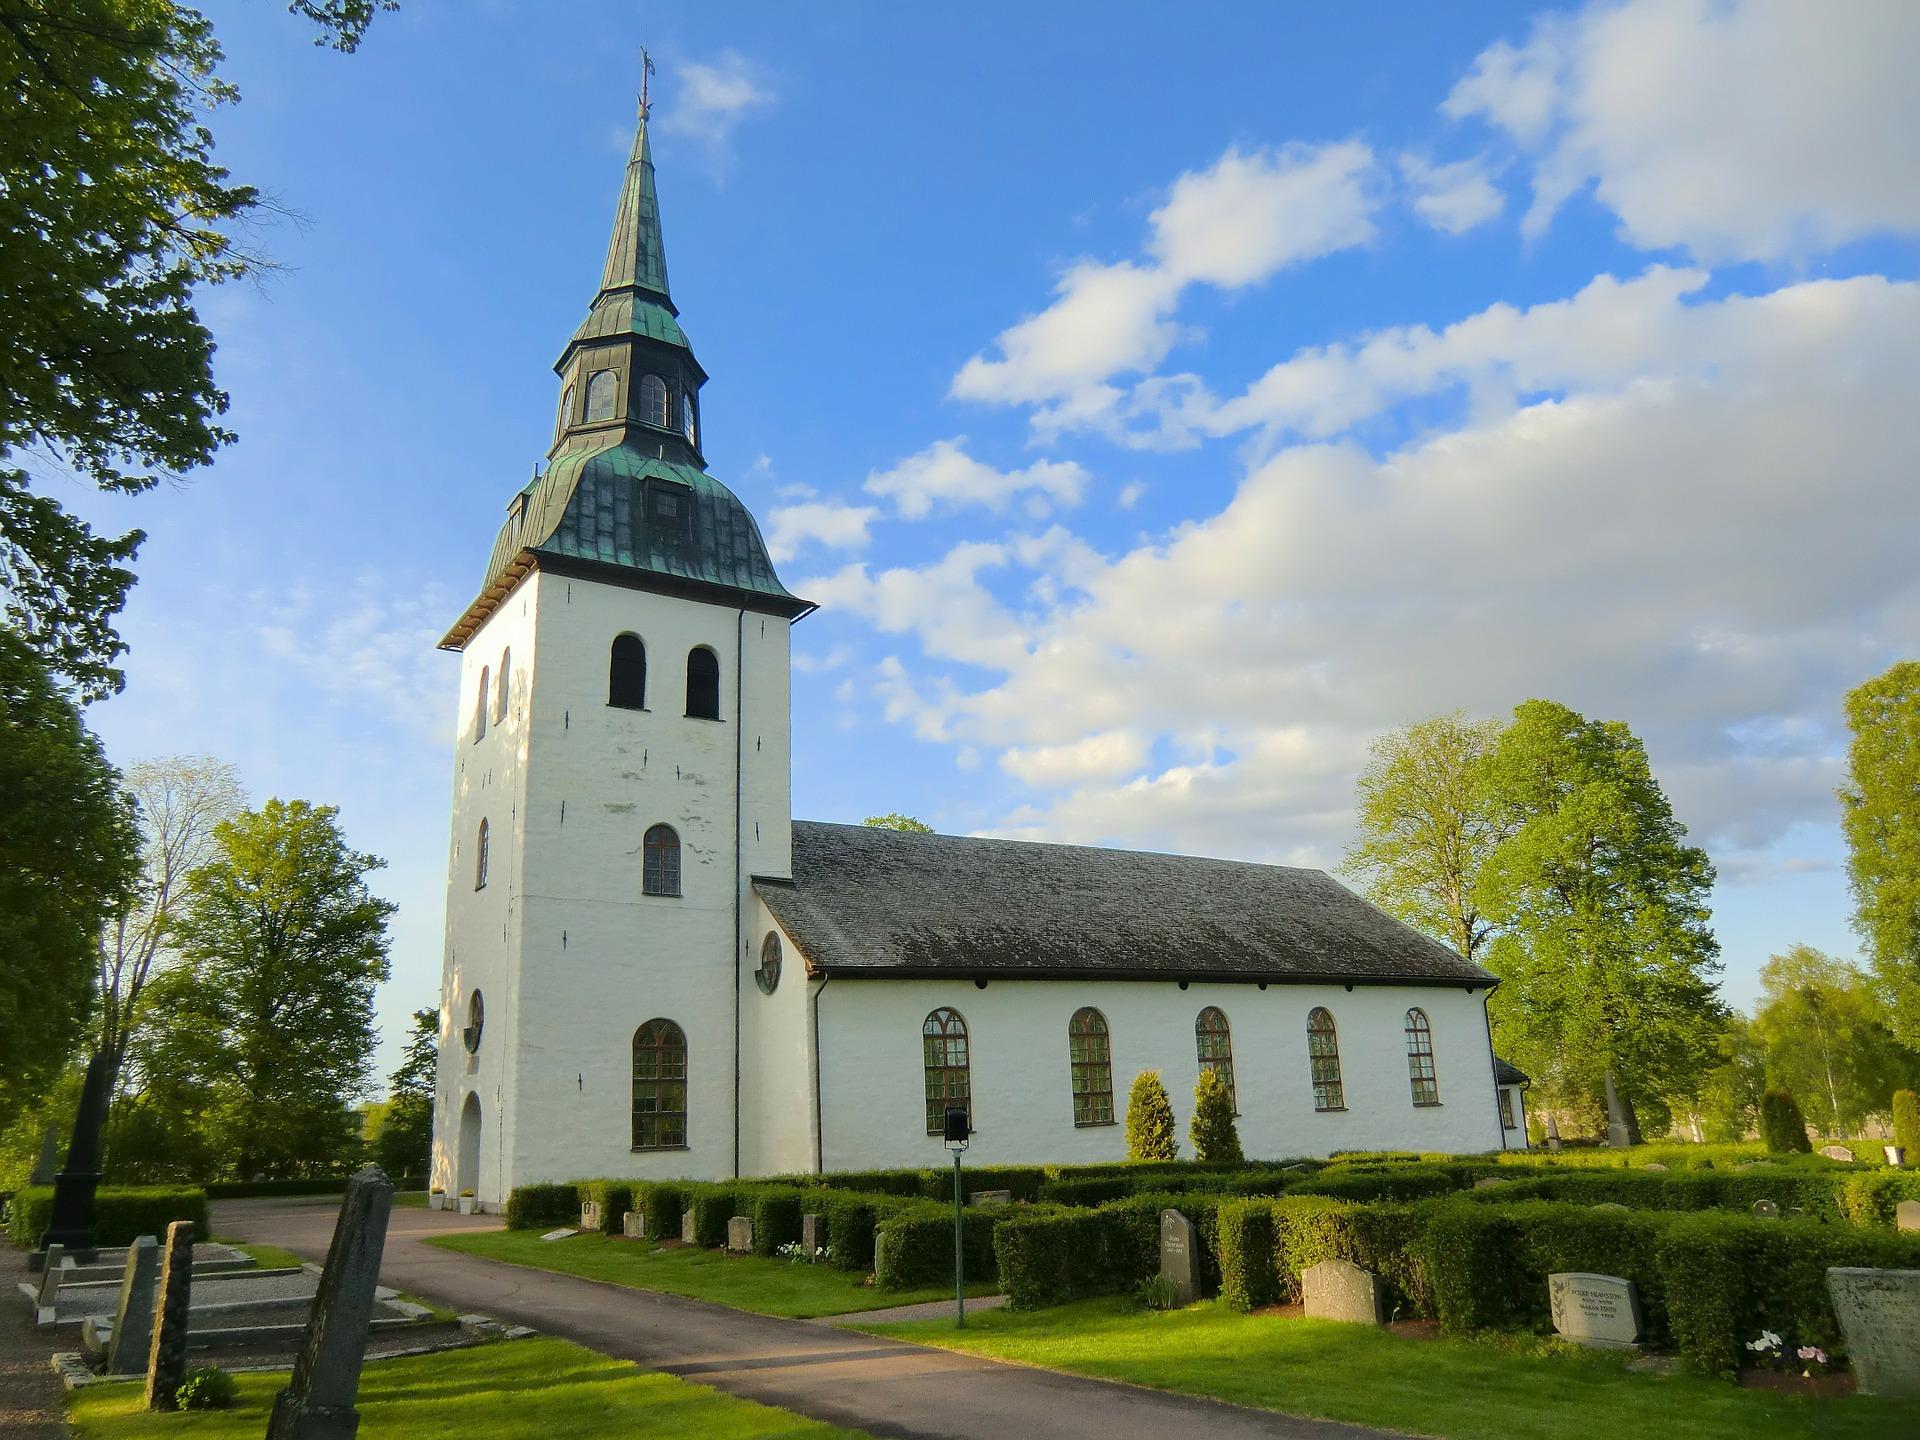 Kyrkogård i Värmland